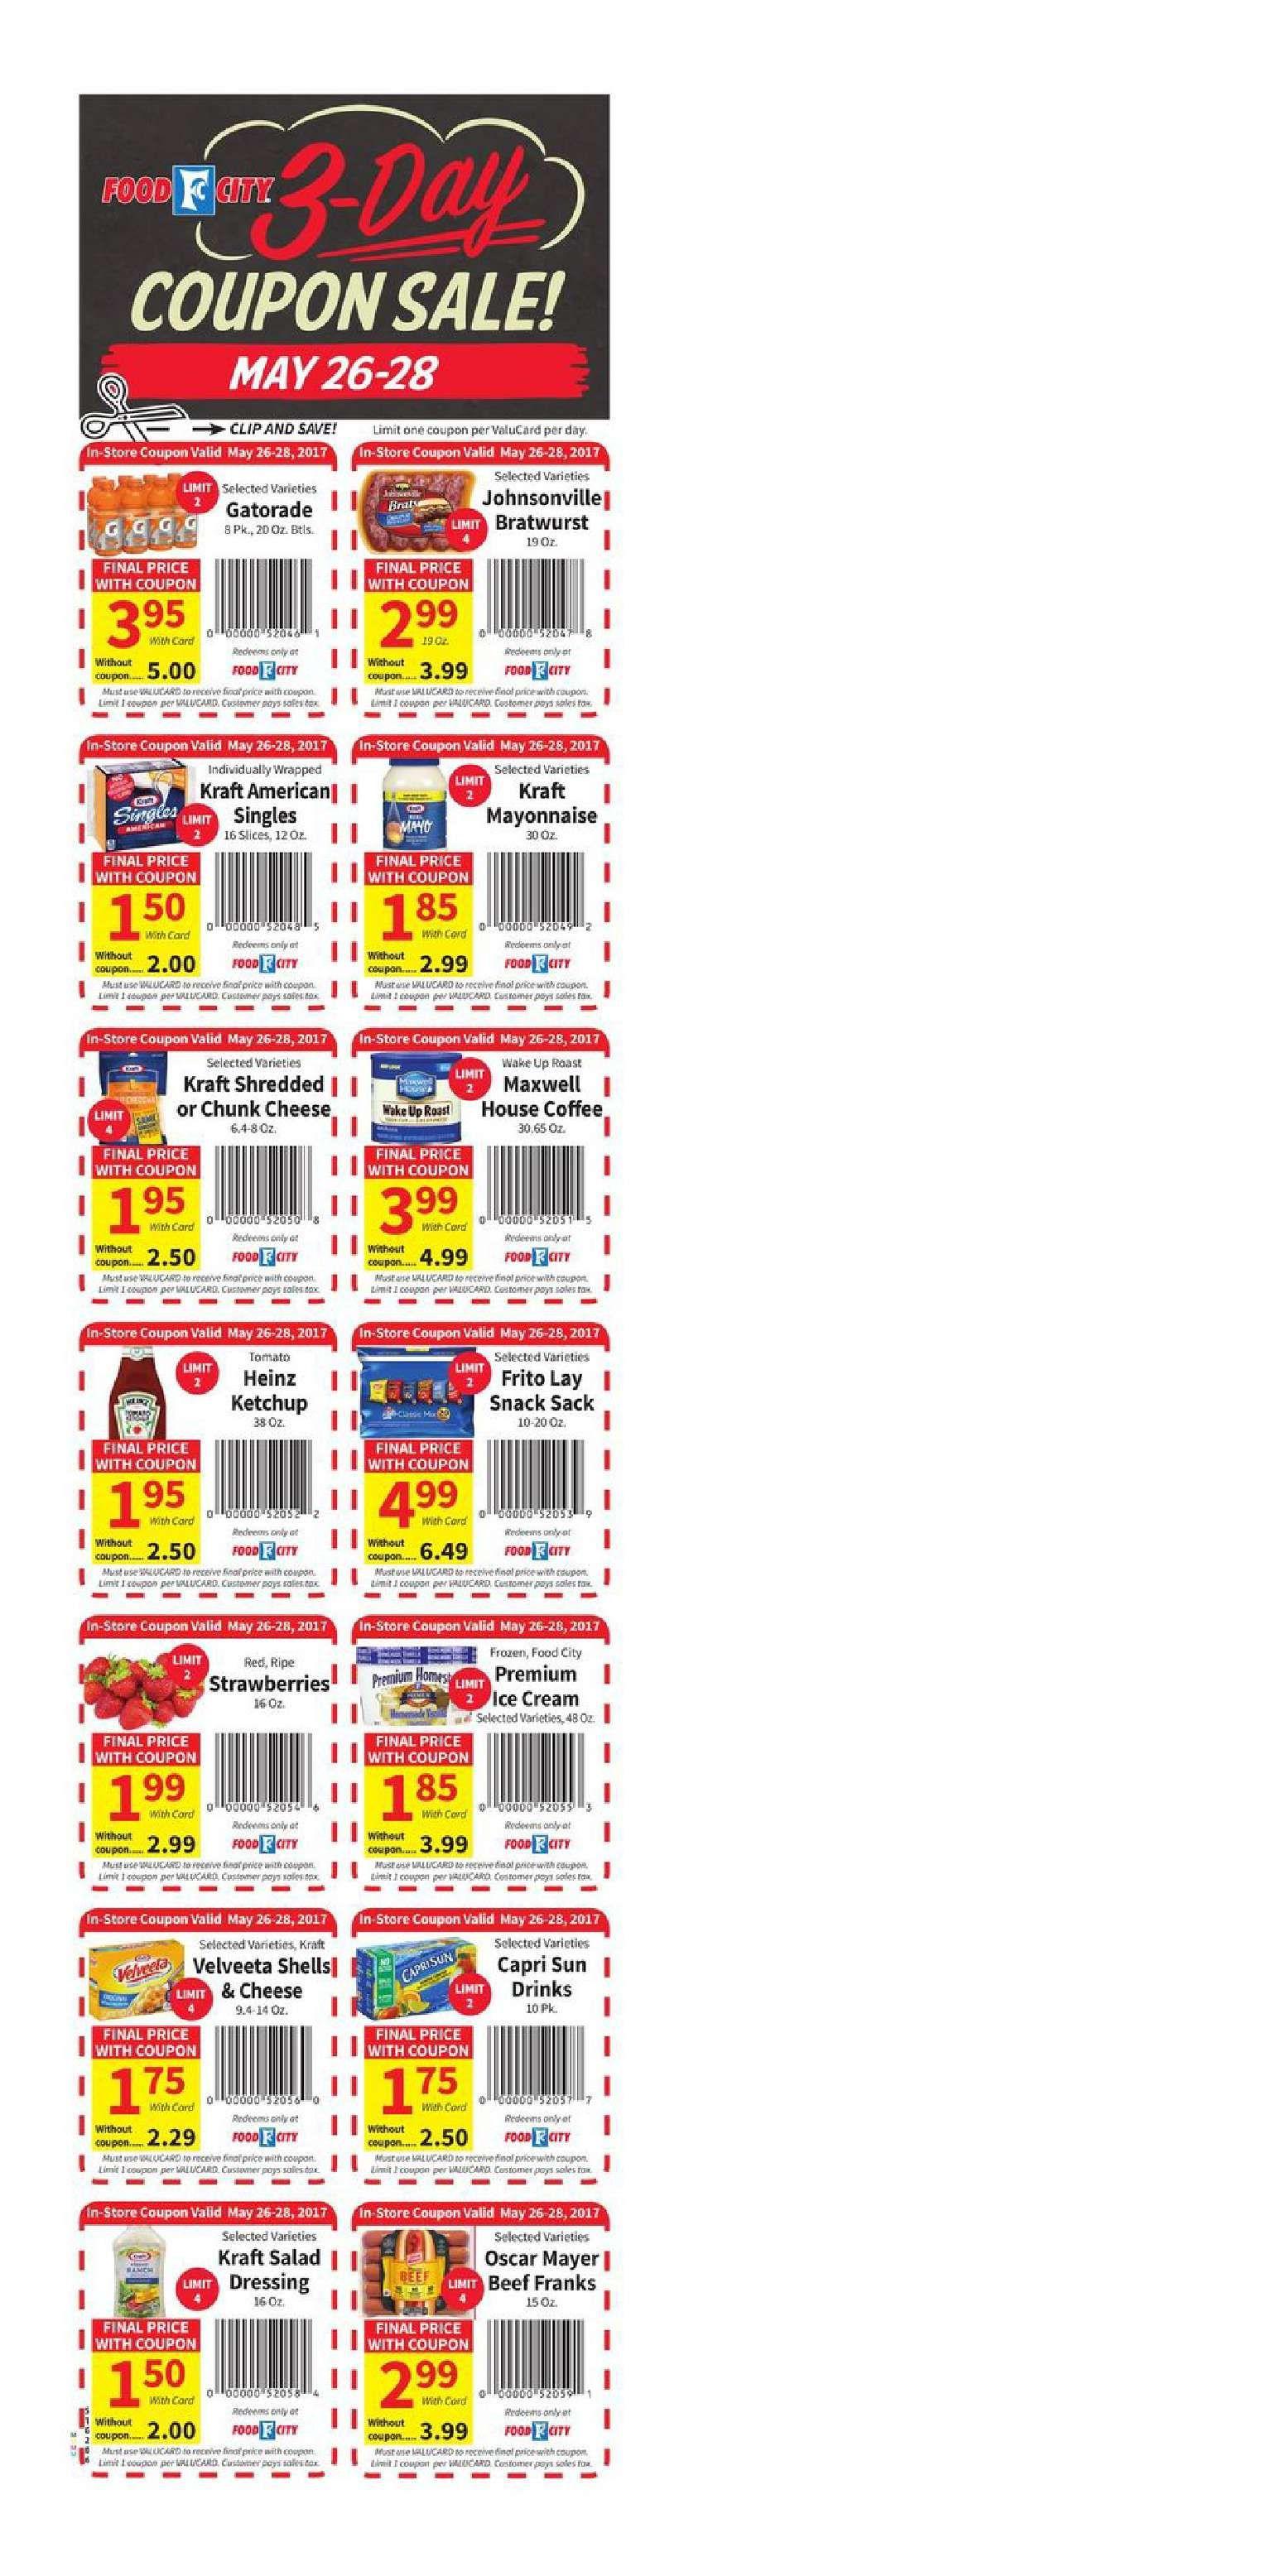 Food city coupon sale may 26 28 2017 food city